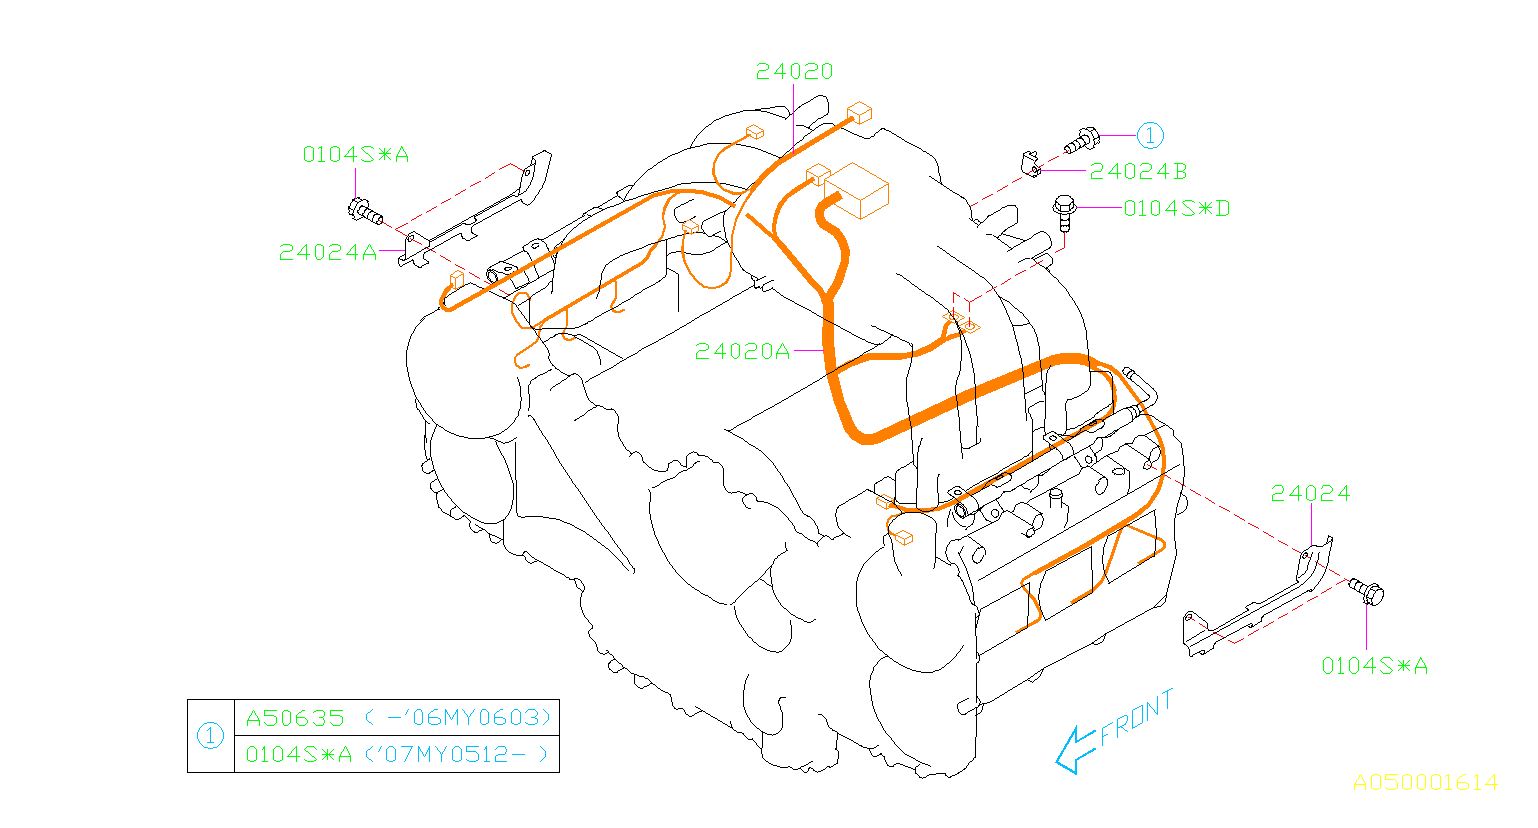 2006 Subaru Tribeca 3 0l 5st-e Harness Engine  Wiring  Manifold  Intake  Cooling